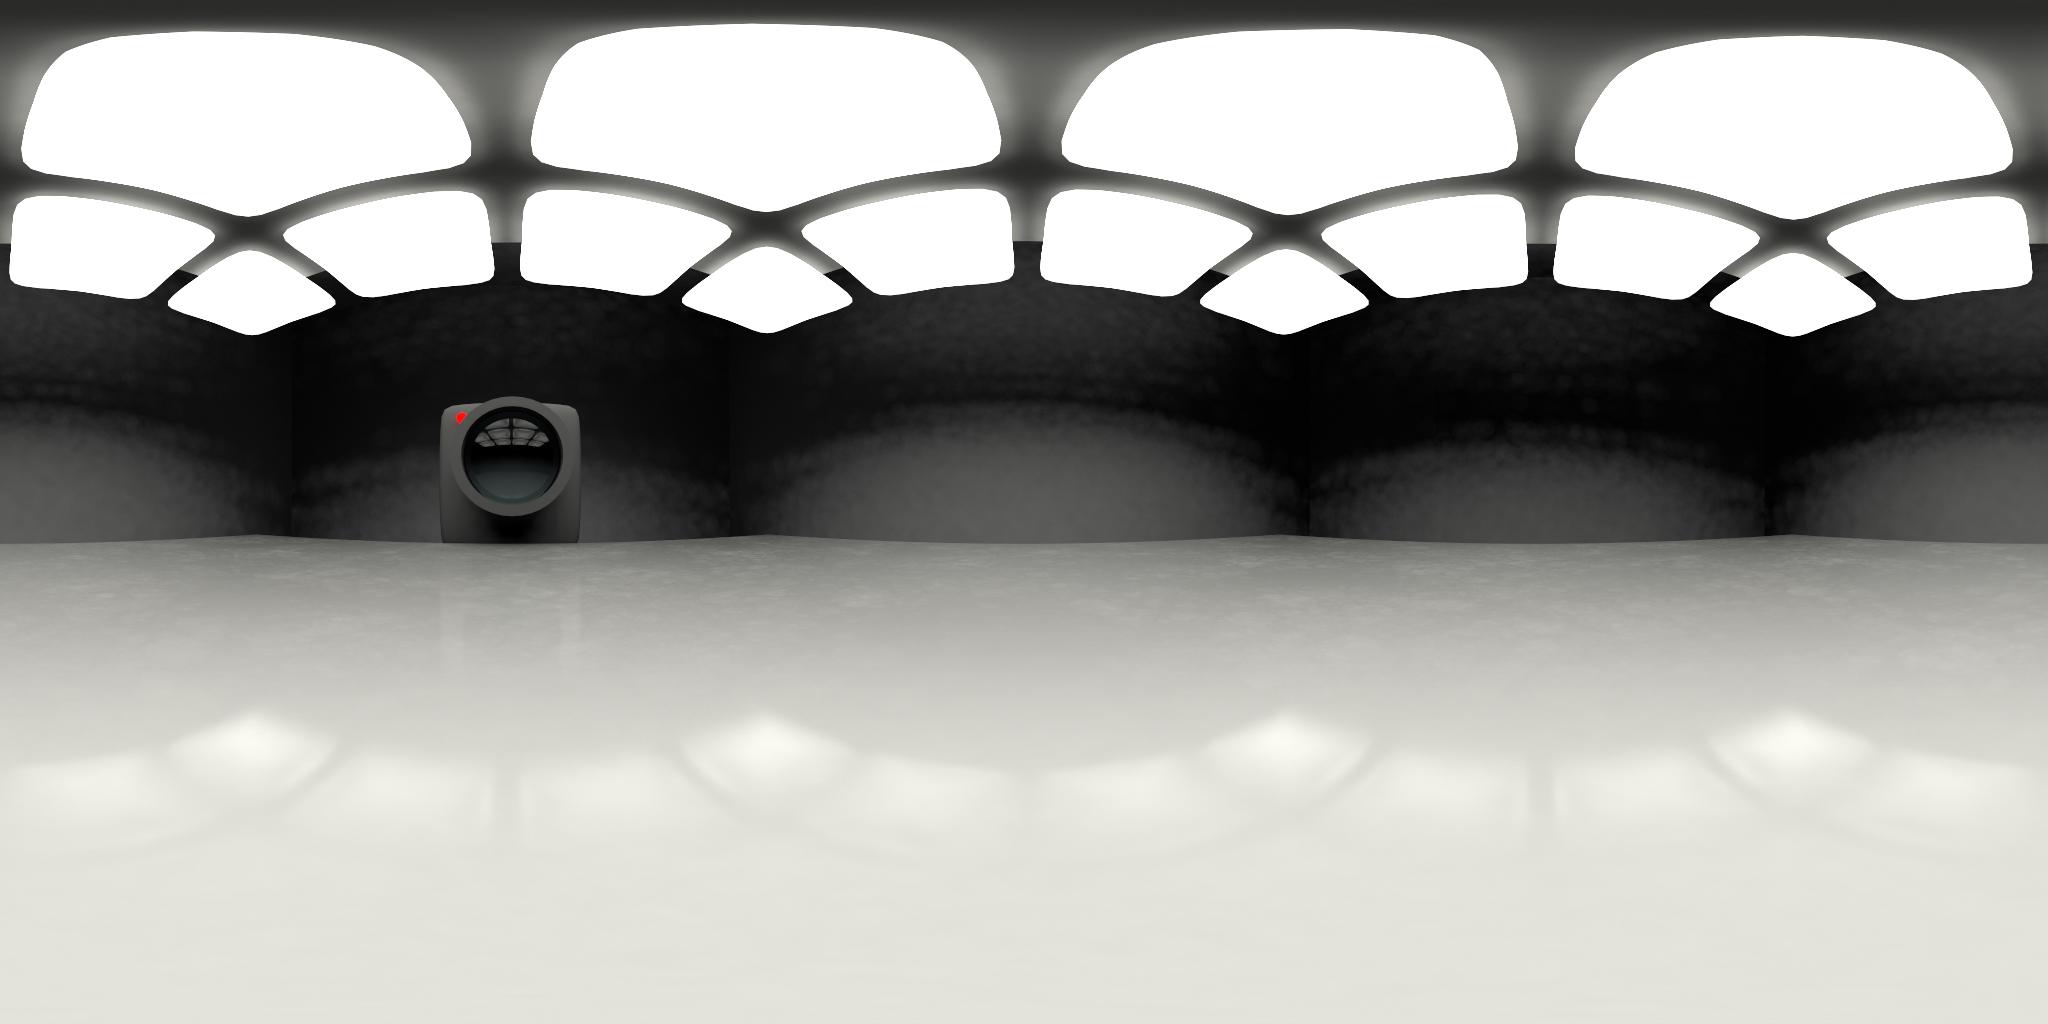 Bright-Roof-Multi by pumpkinman68 on DeviantArt